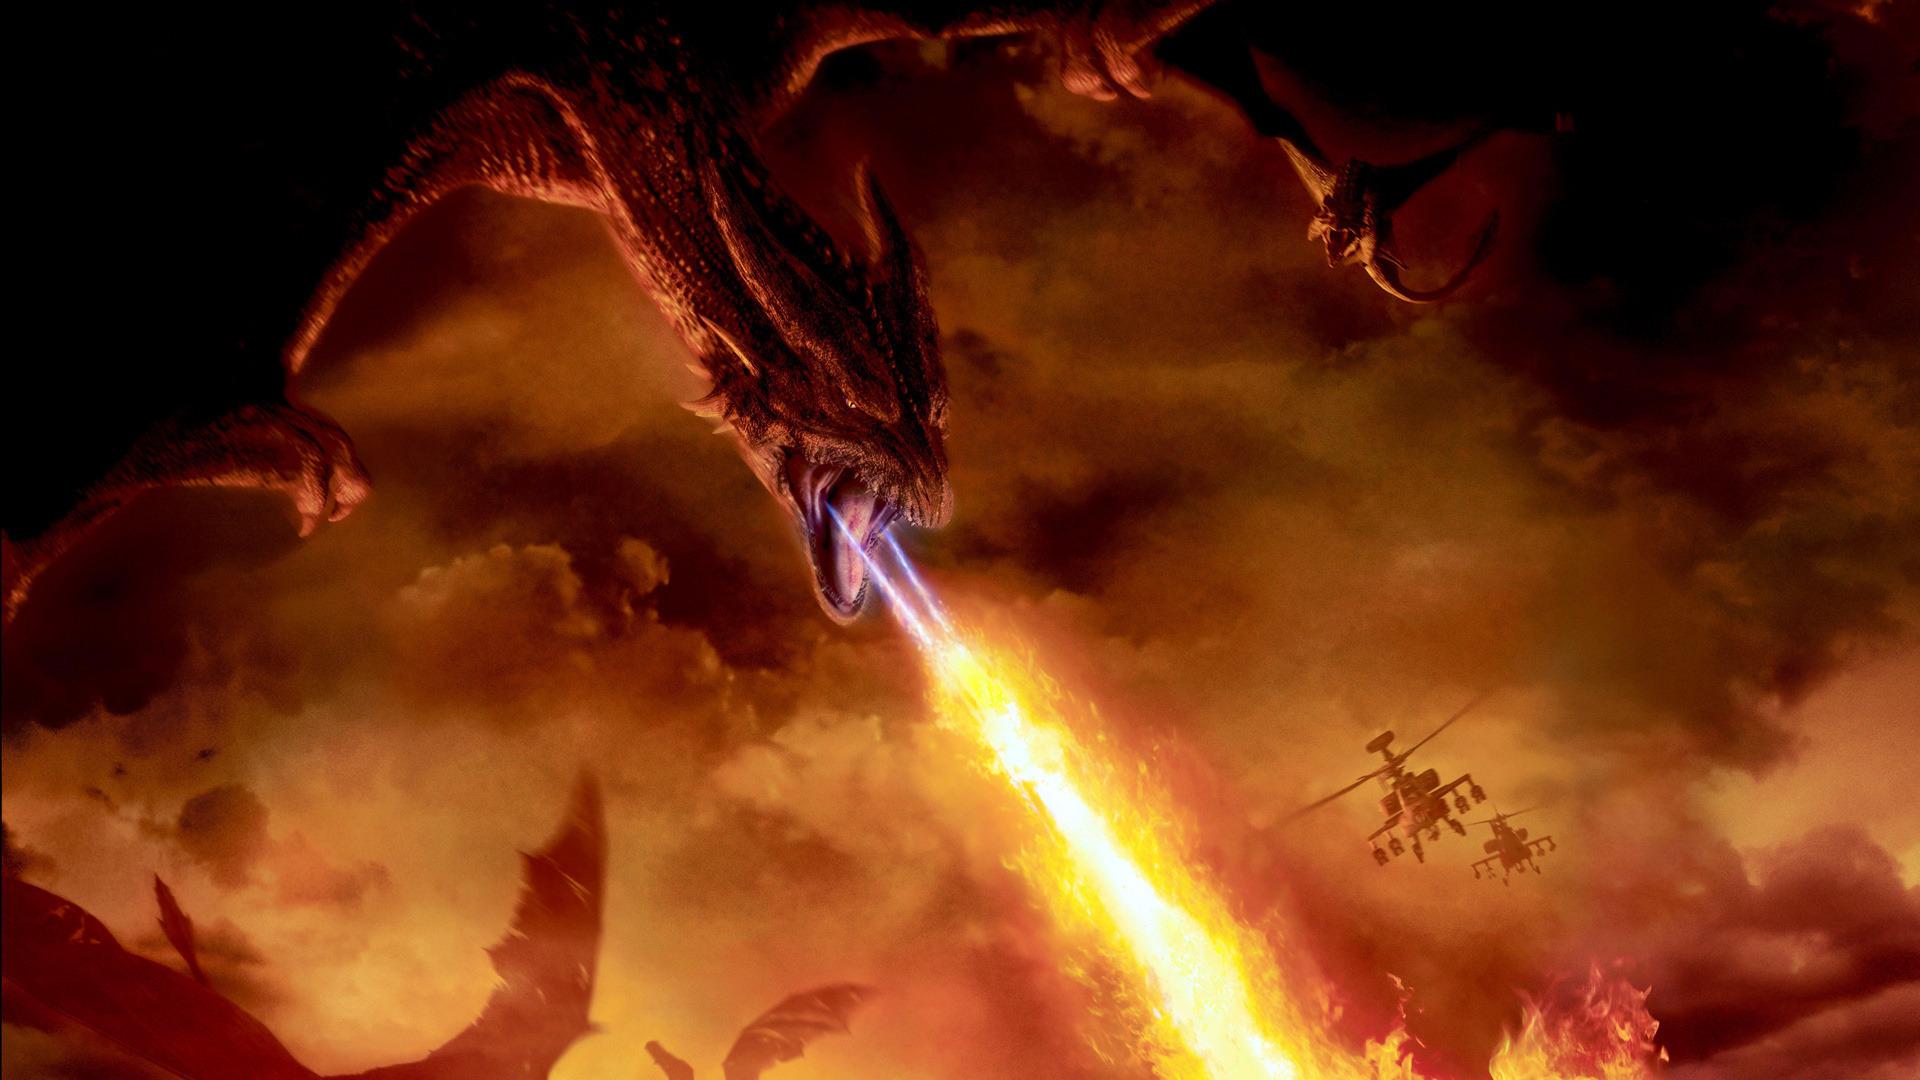 Fire Breathing Dragons Wallpaper Fire Breathing Dragon